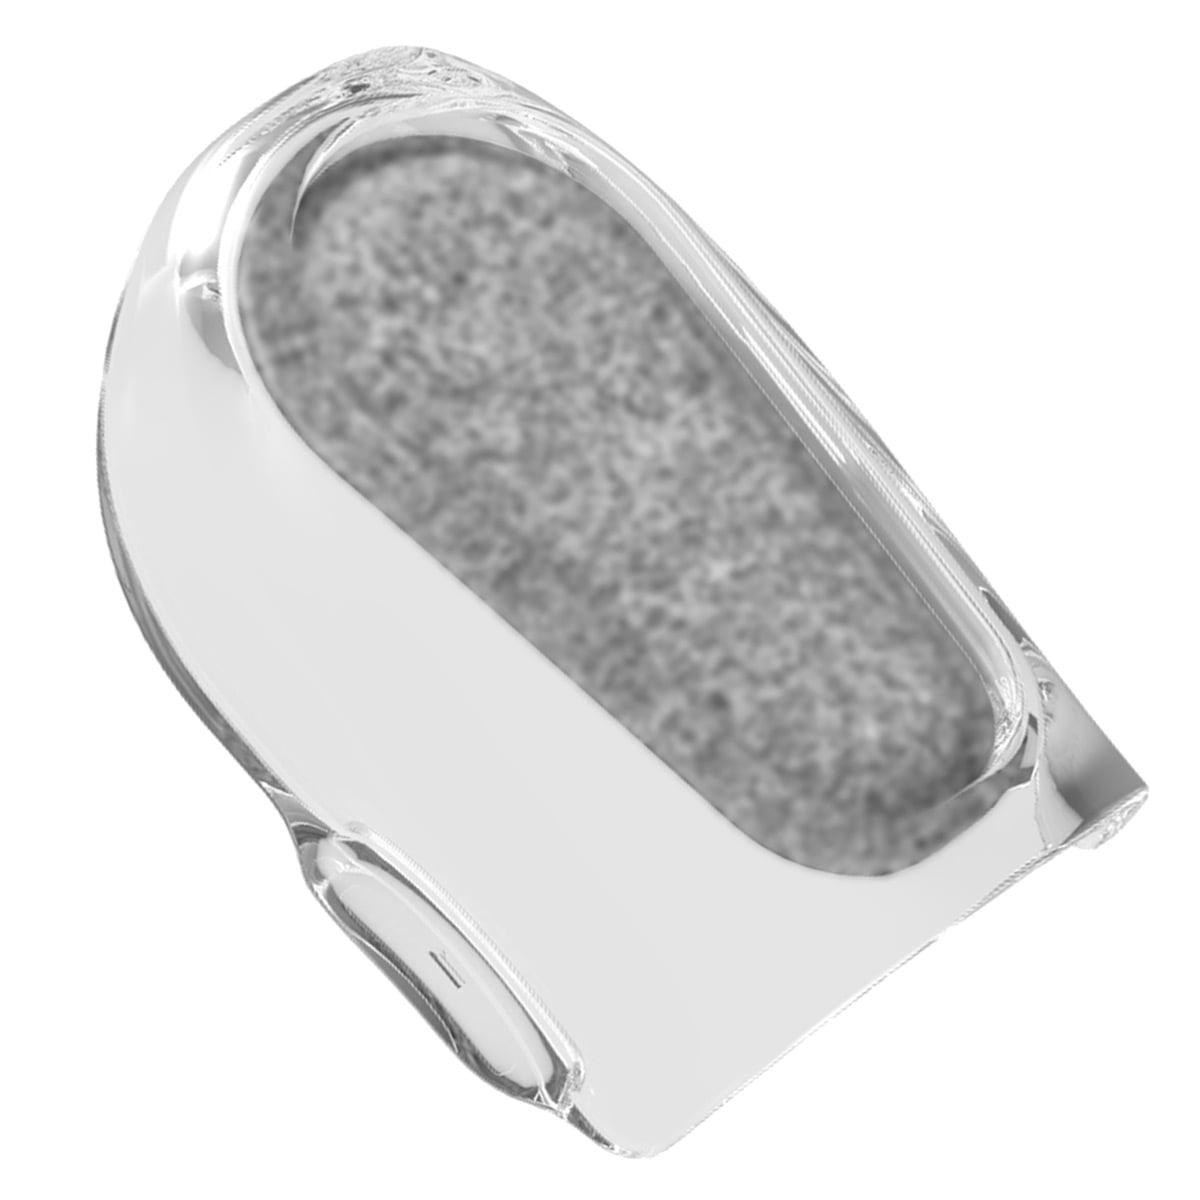 Diffuser for Brevida Nasal Pillow CPAP Mask